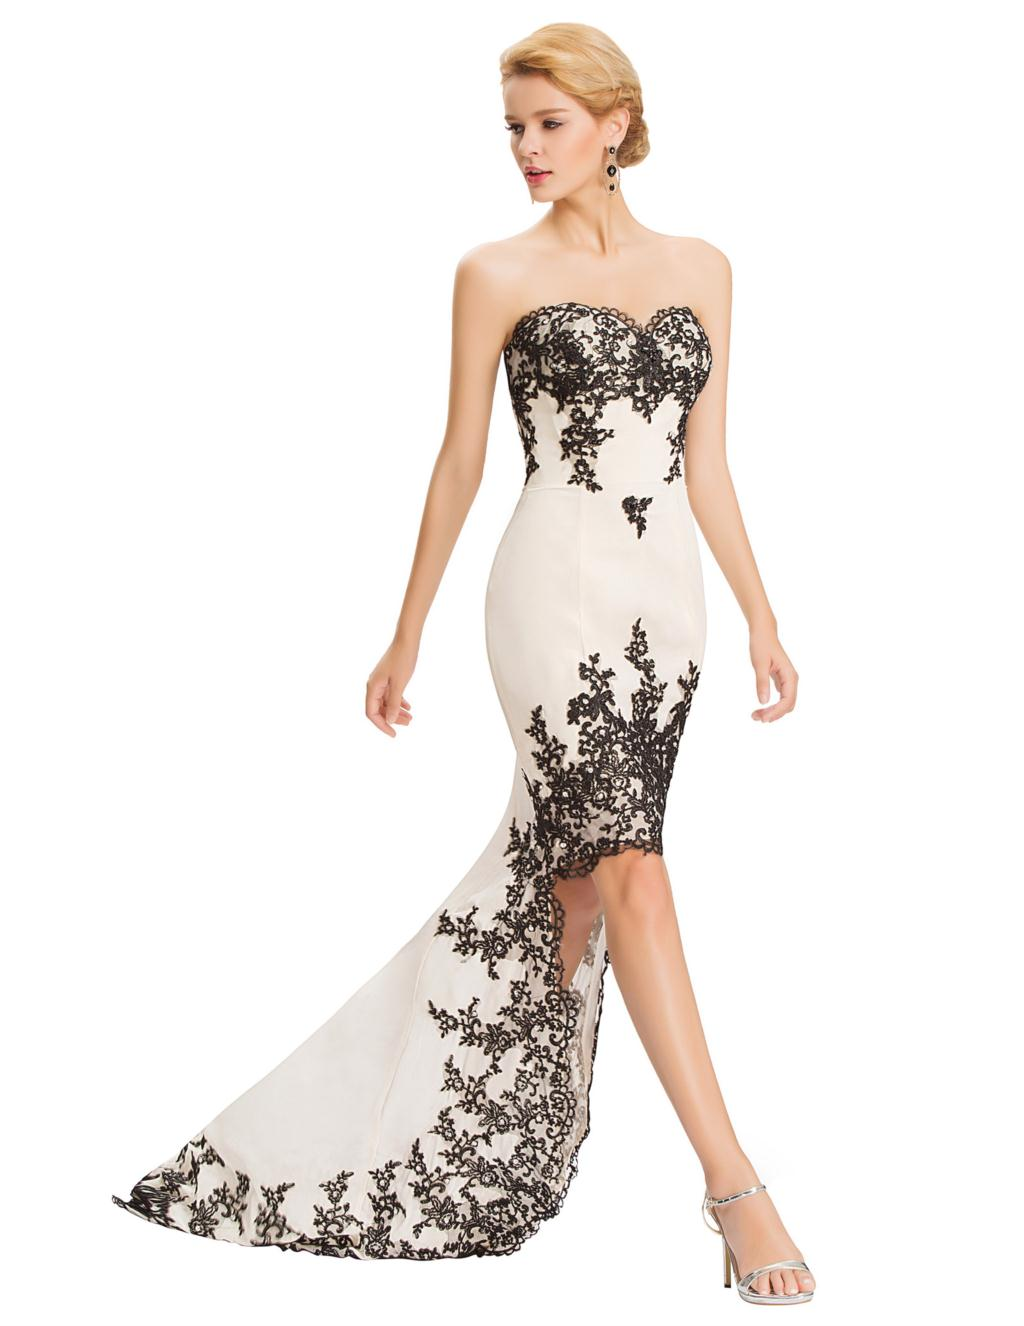 White dress long back short front top